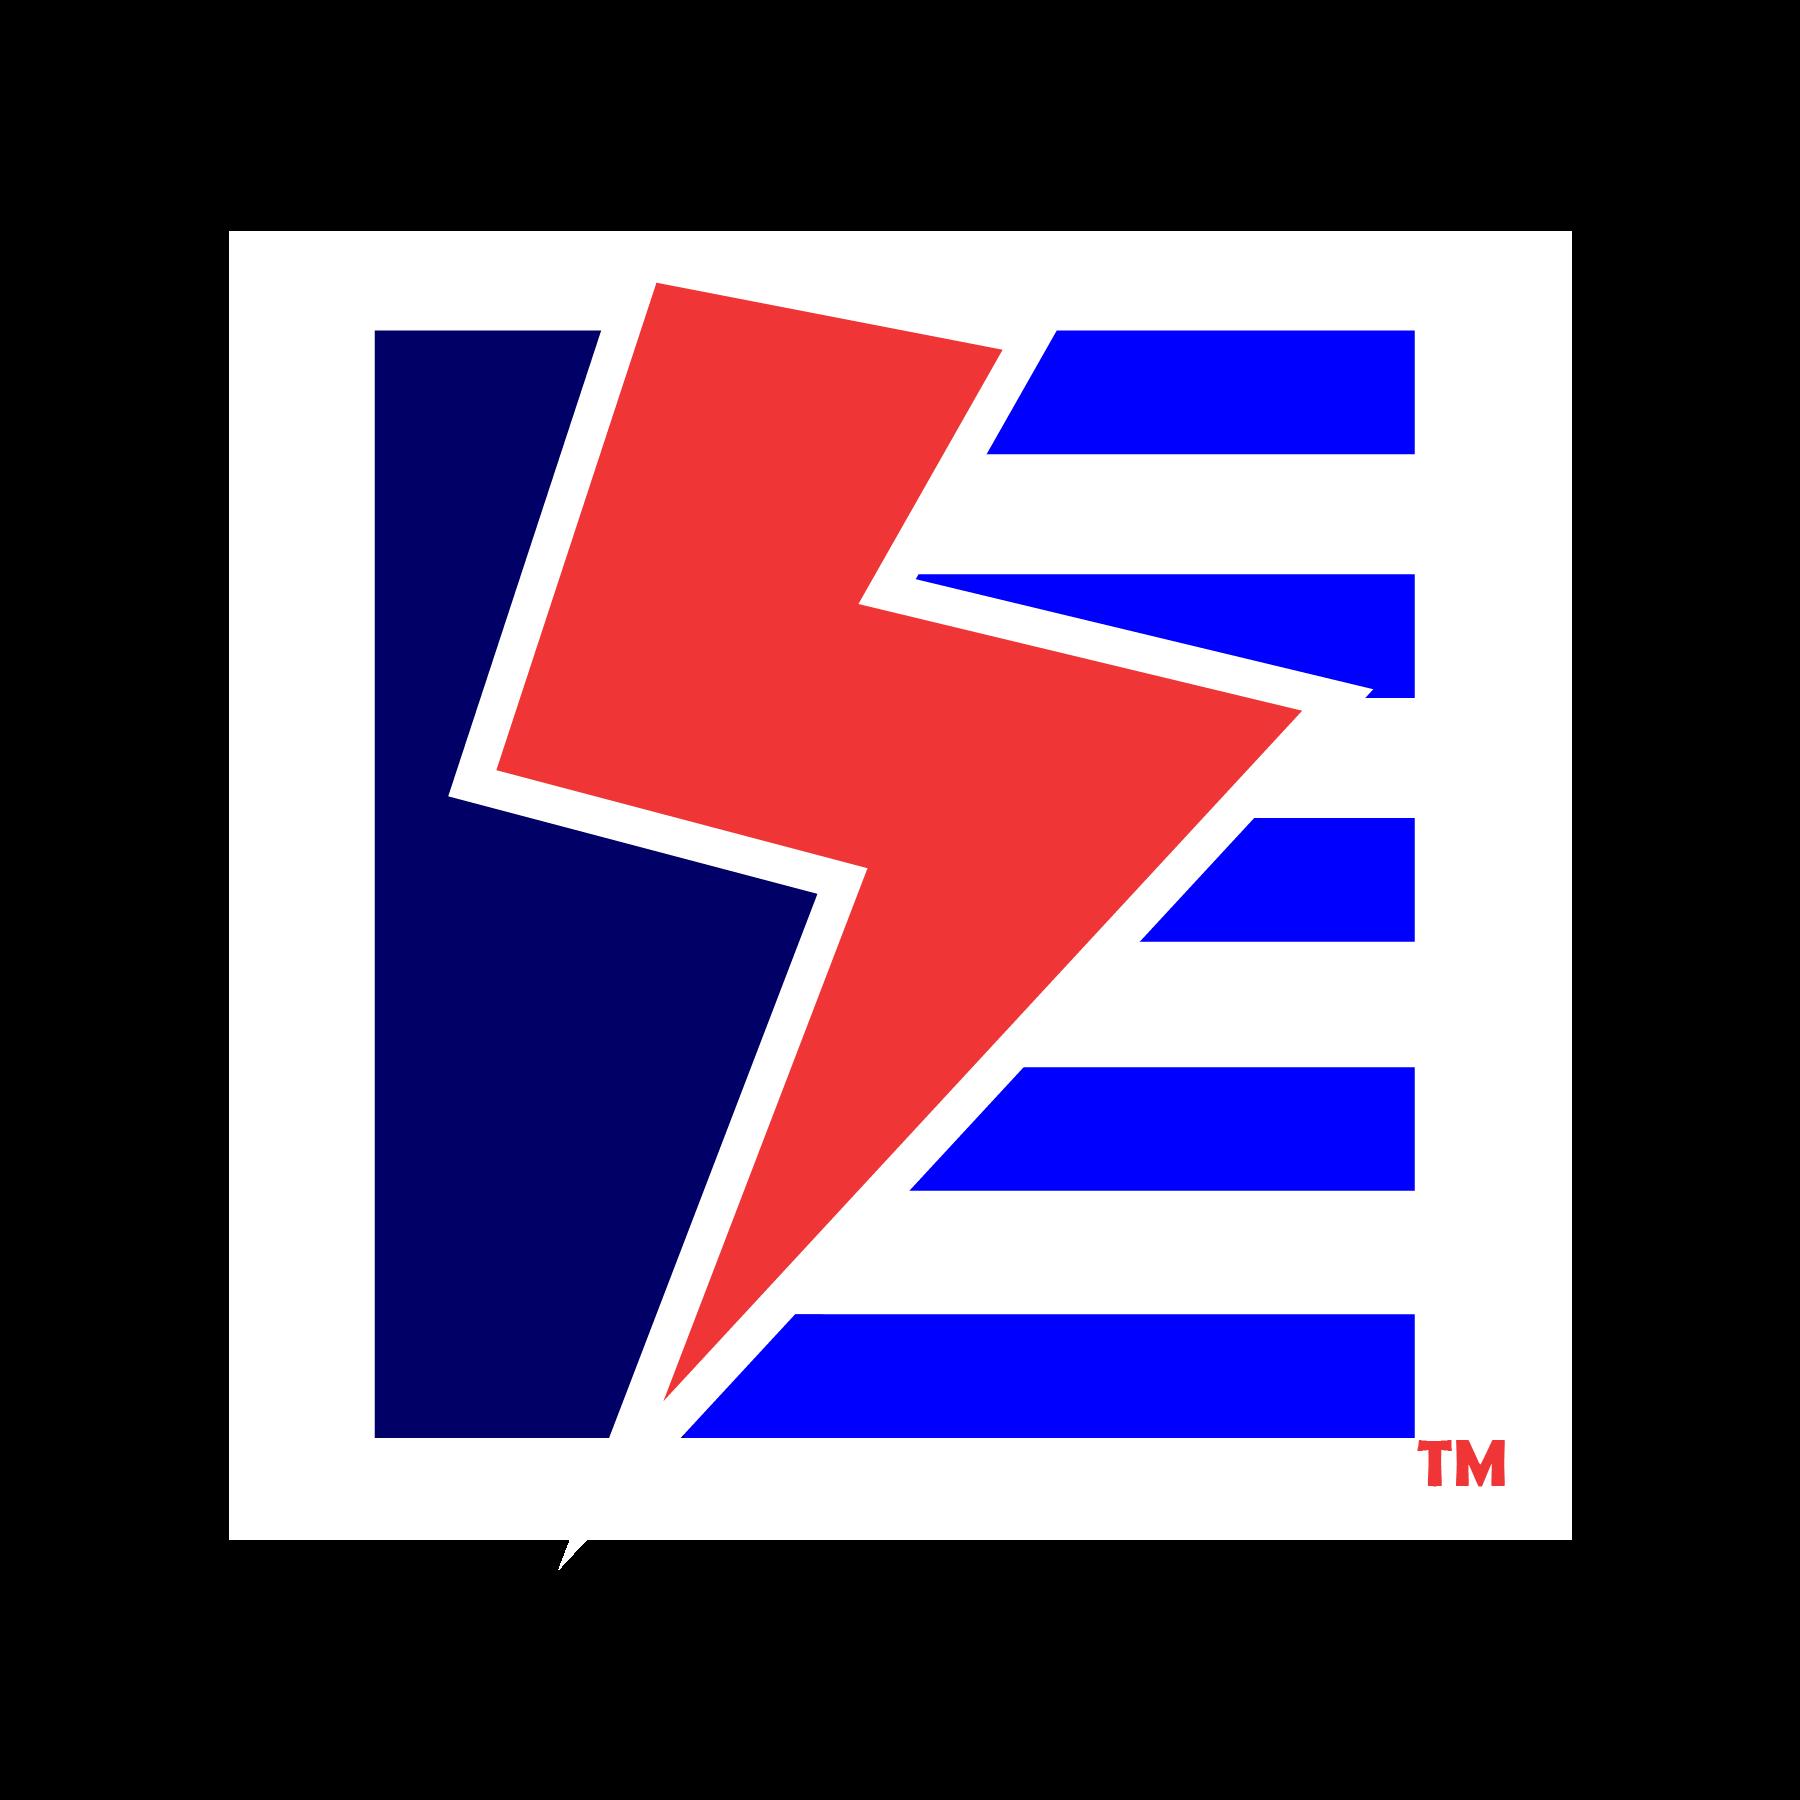 PowerHouse logo tm